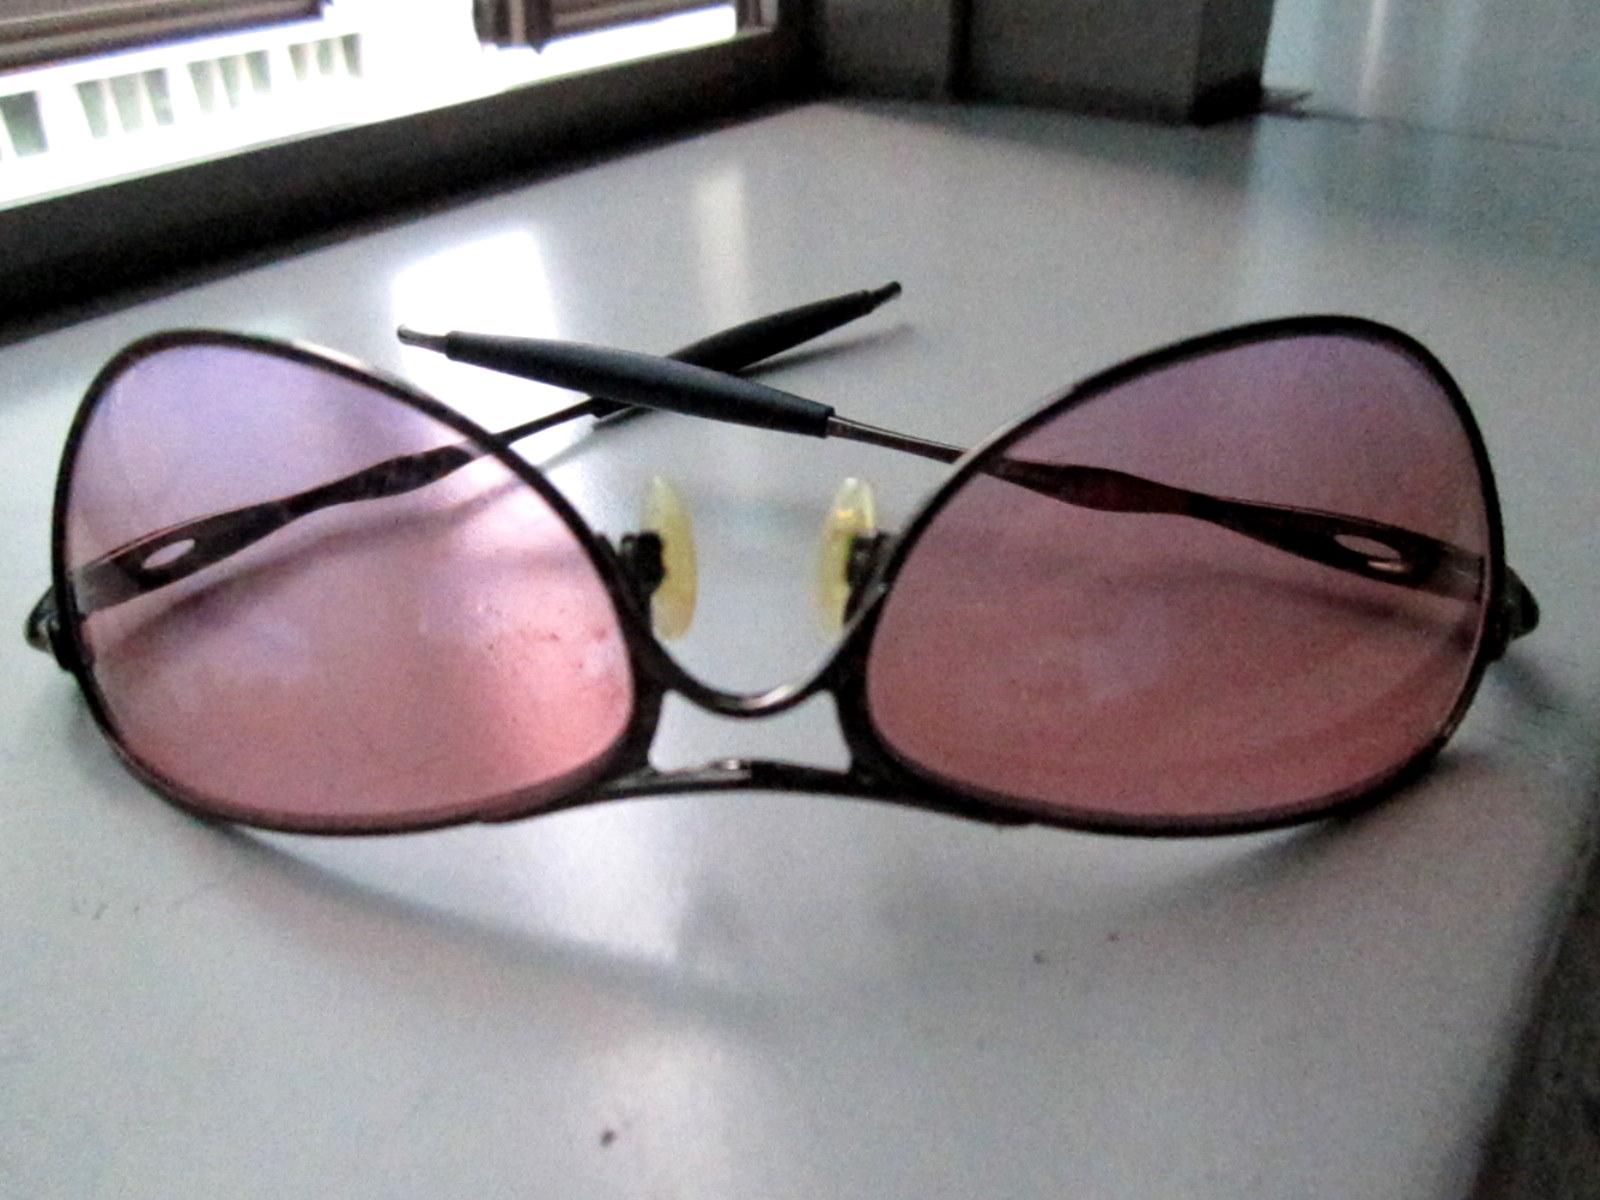 My Glasses Frames Are Peeling : Oakley Sunglasses Lens Peeling